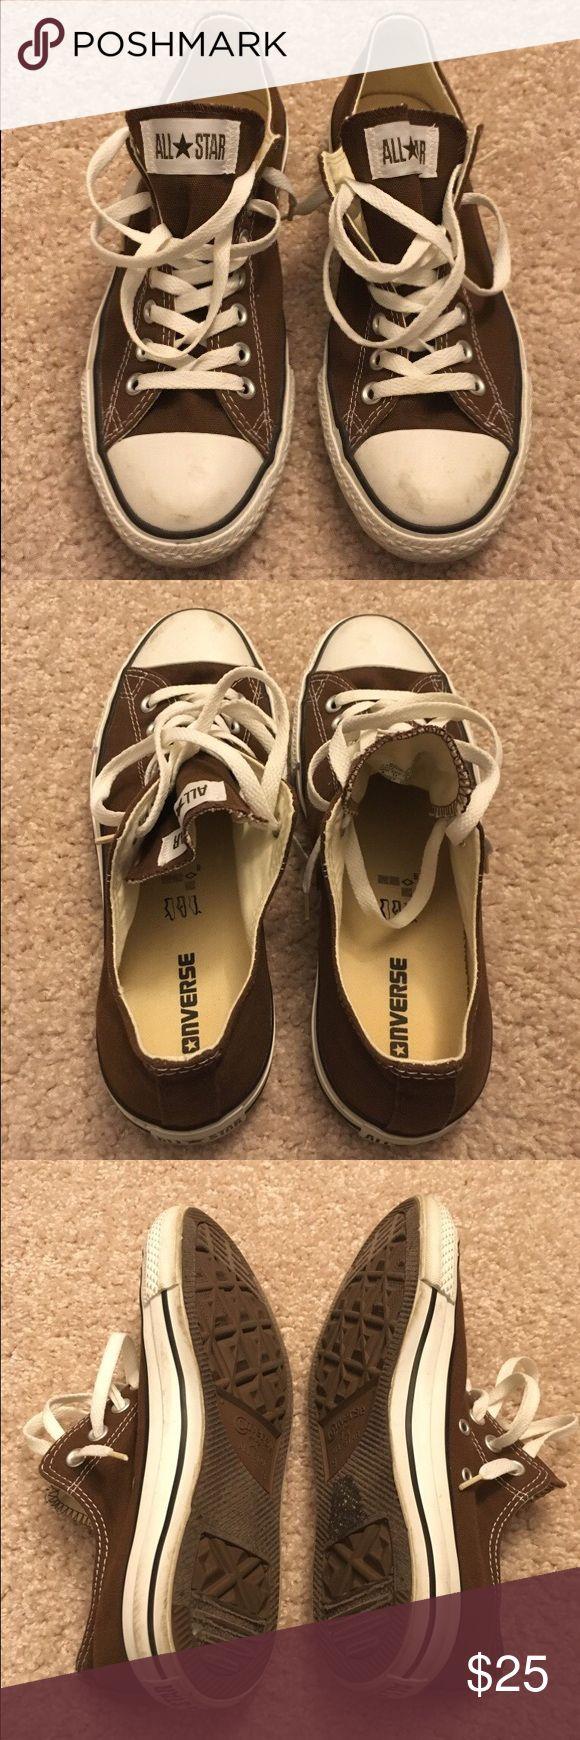 Converse Allstars low top brown Low top brown converse Allstars Converse Shoes Sneakers